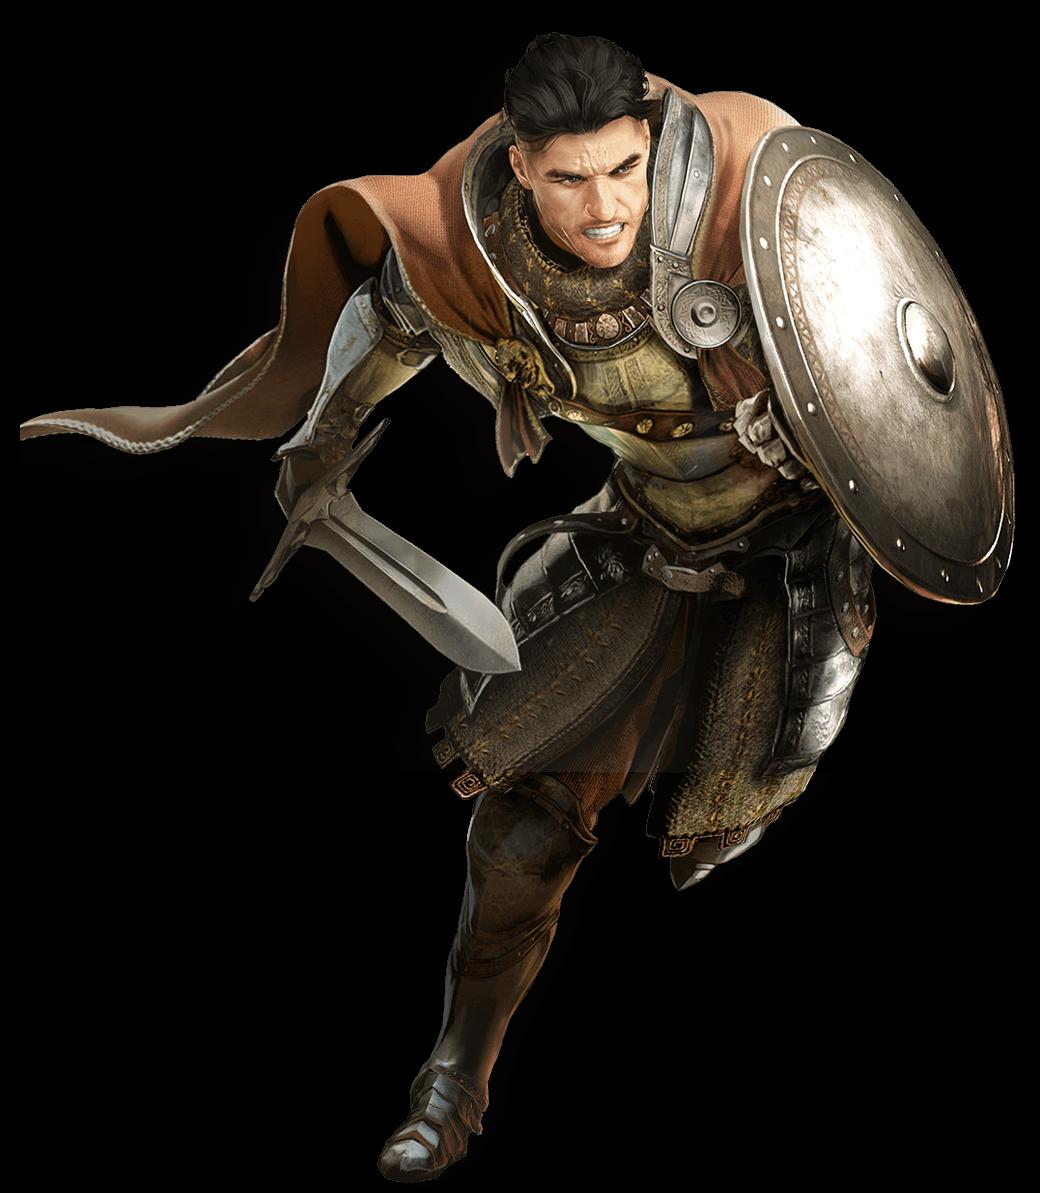 Warrior Character image